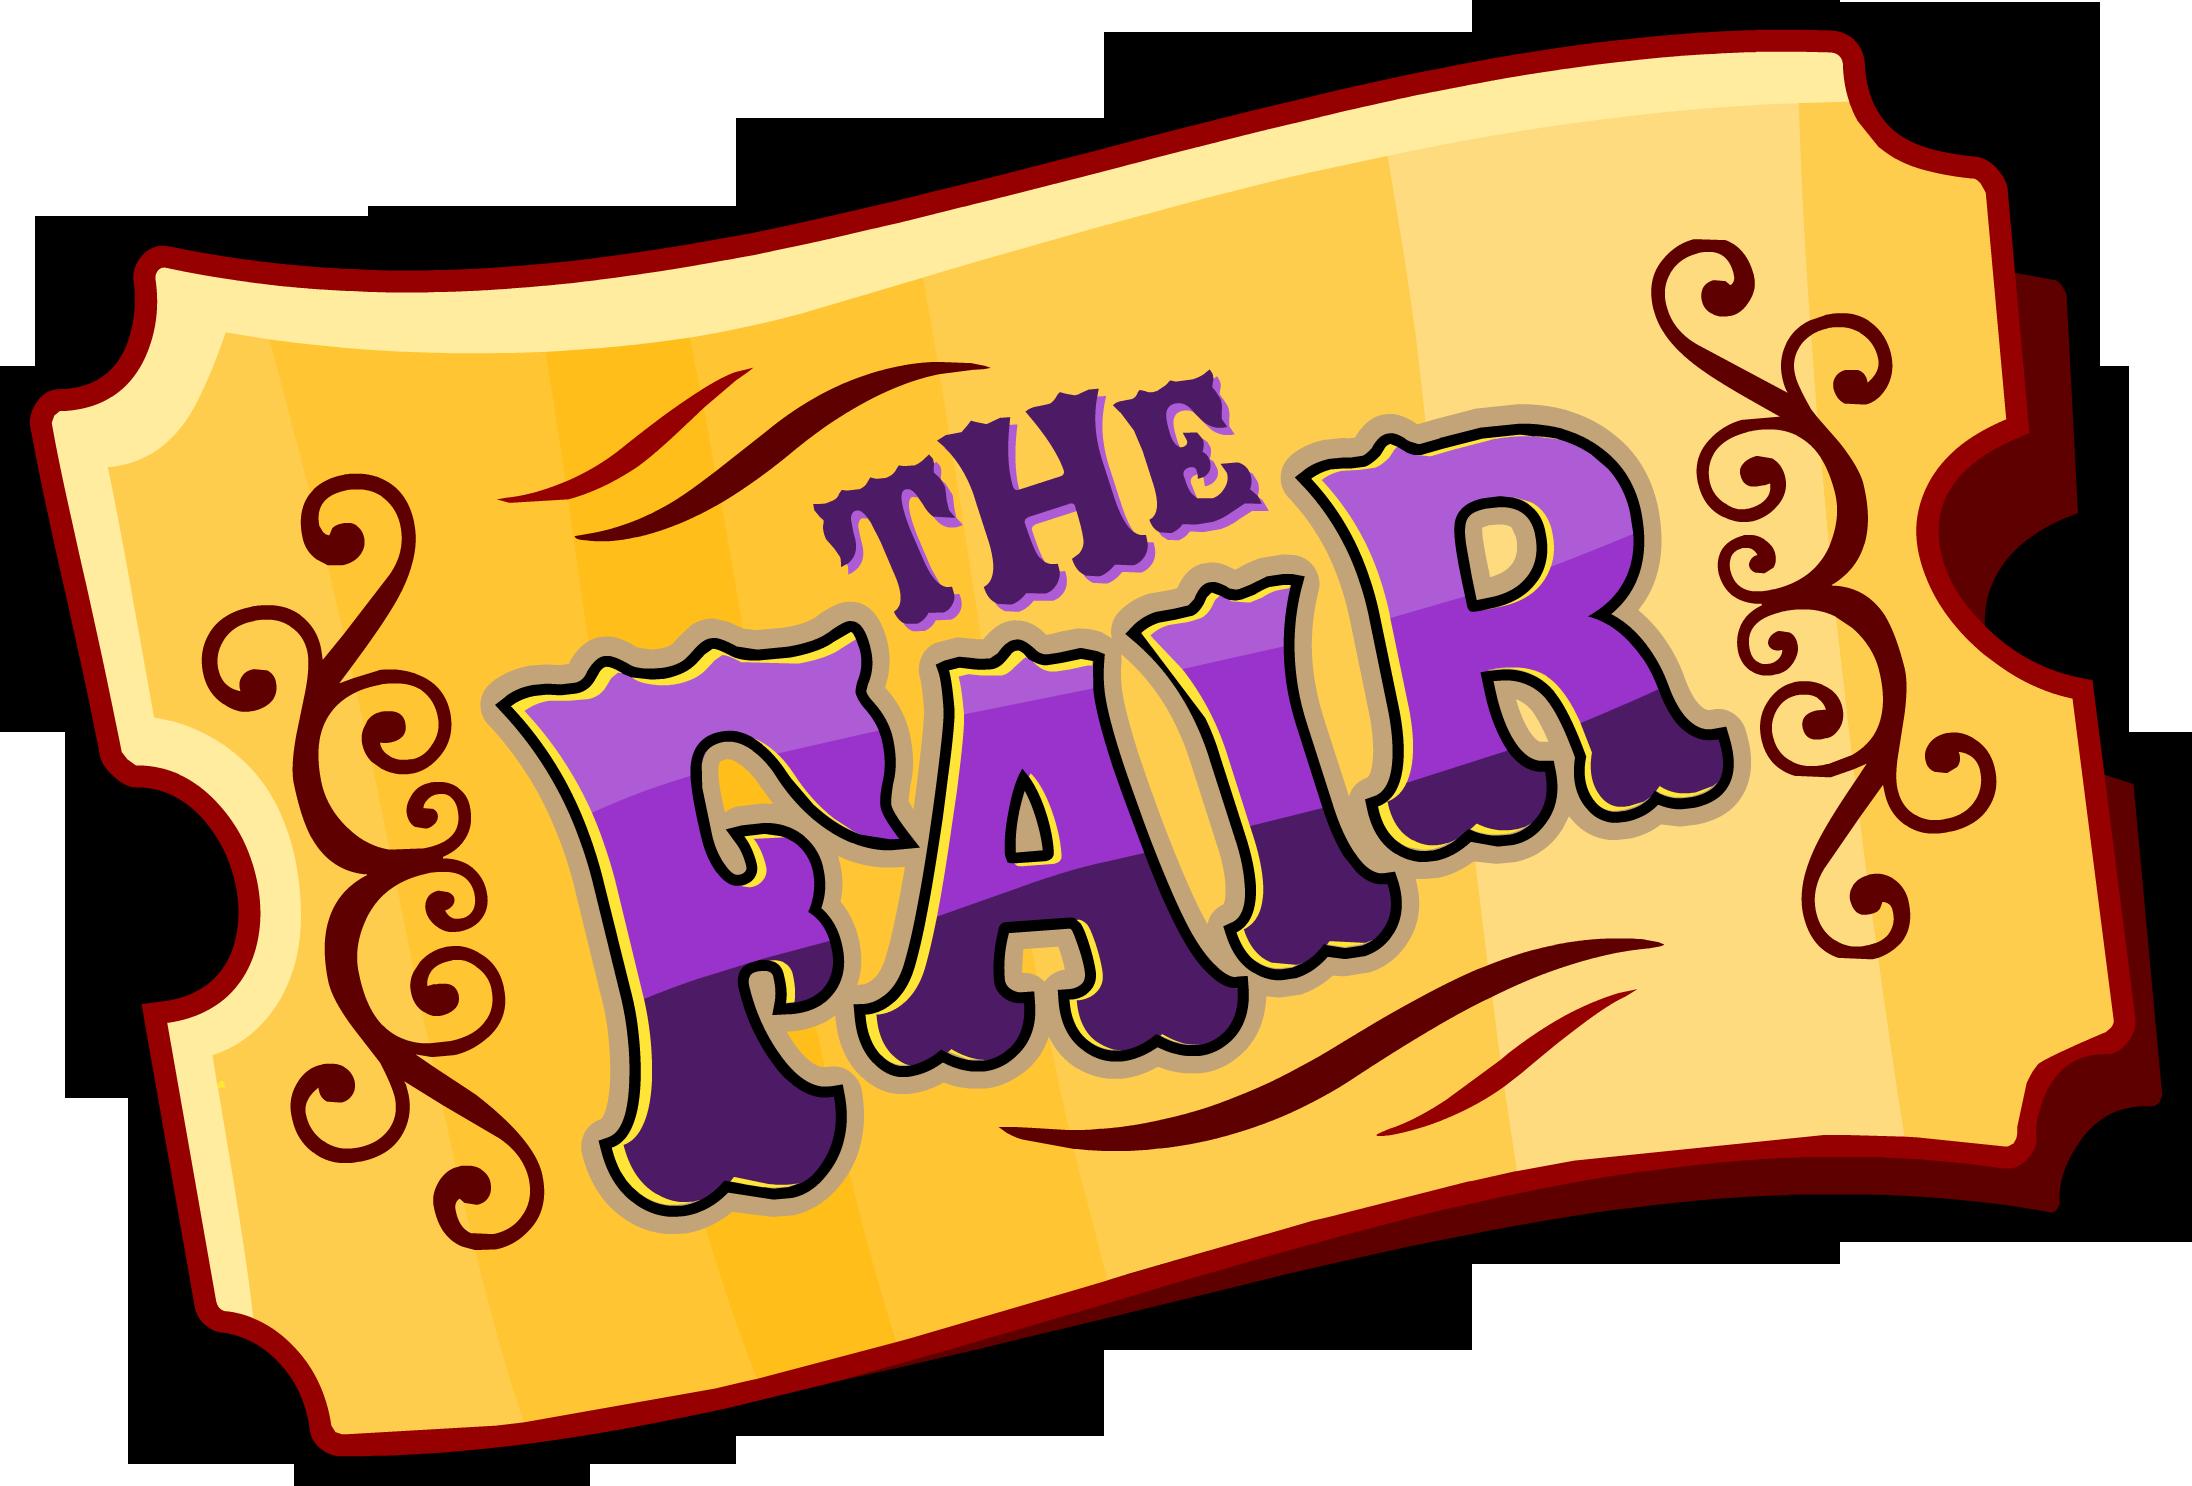 2192x1486 The Fair 2009 Club Penguin Wiki Fandom Powered By Wikia